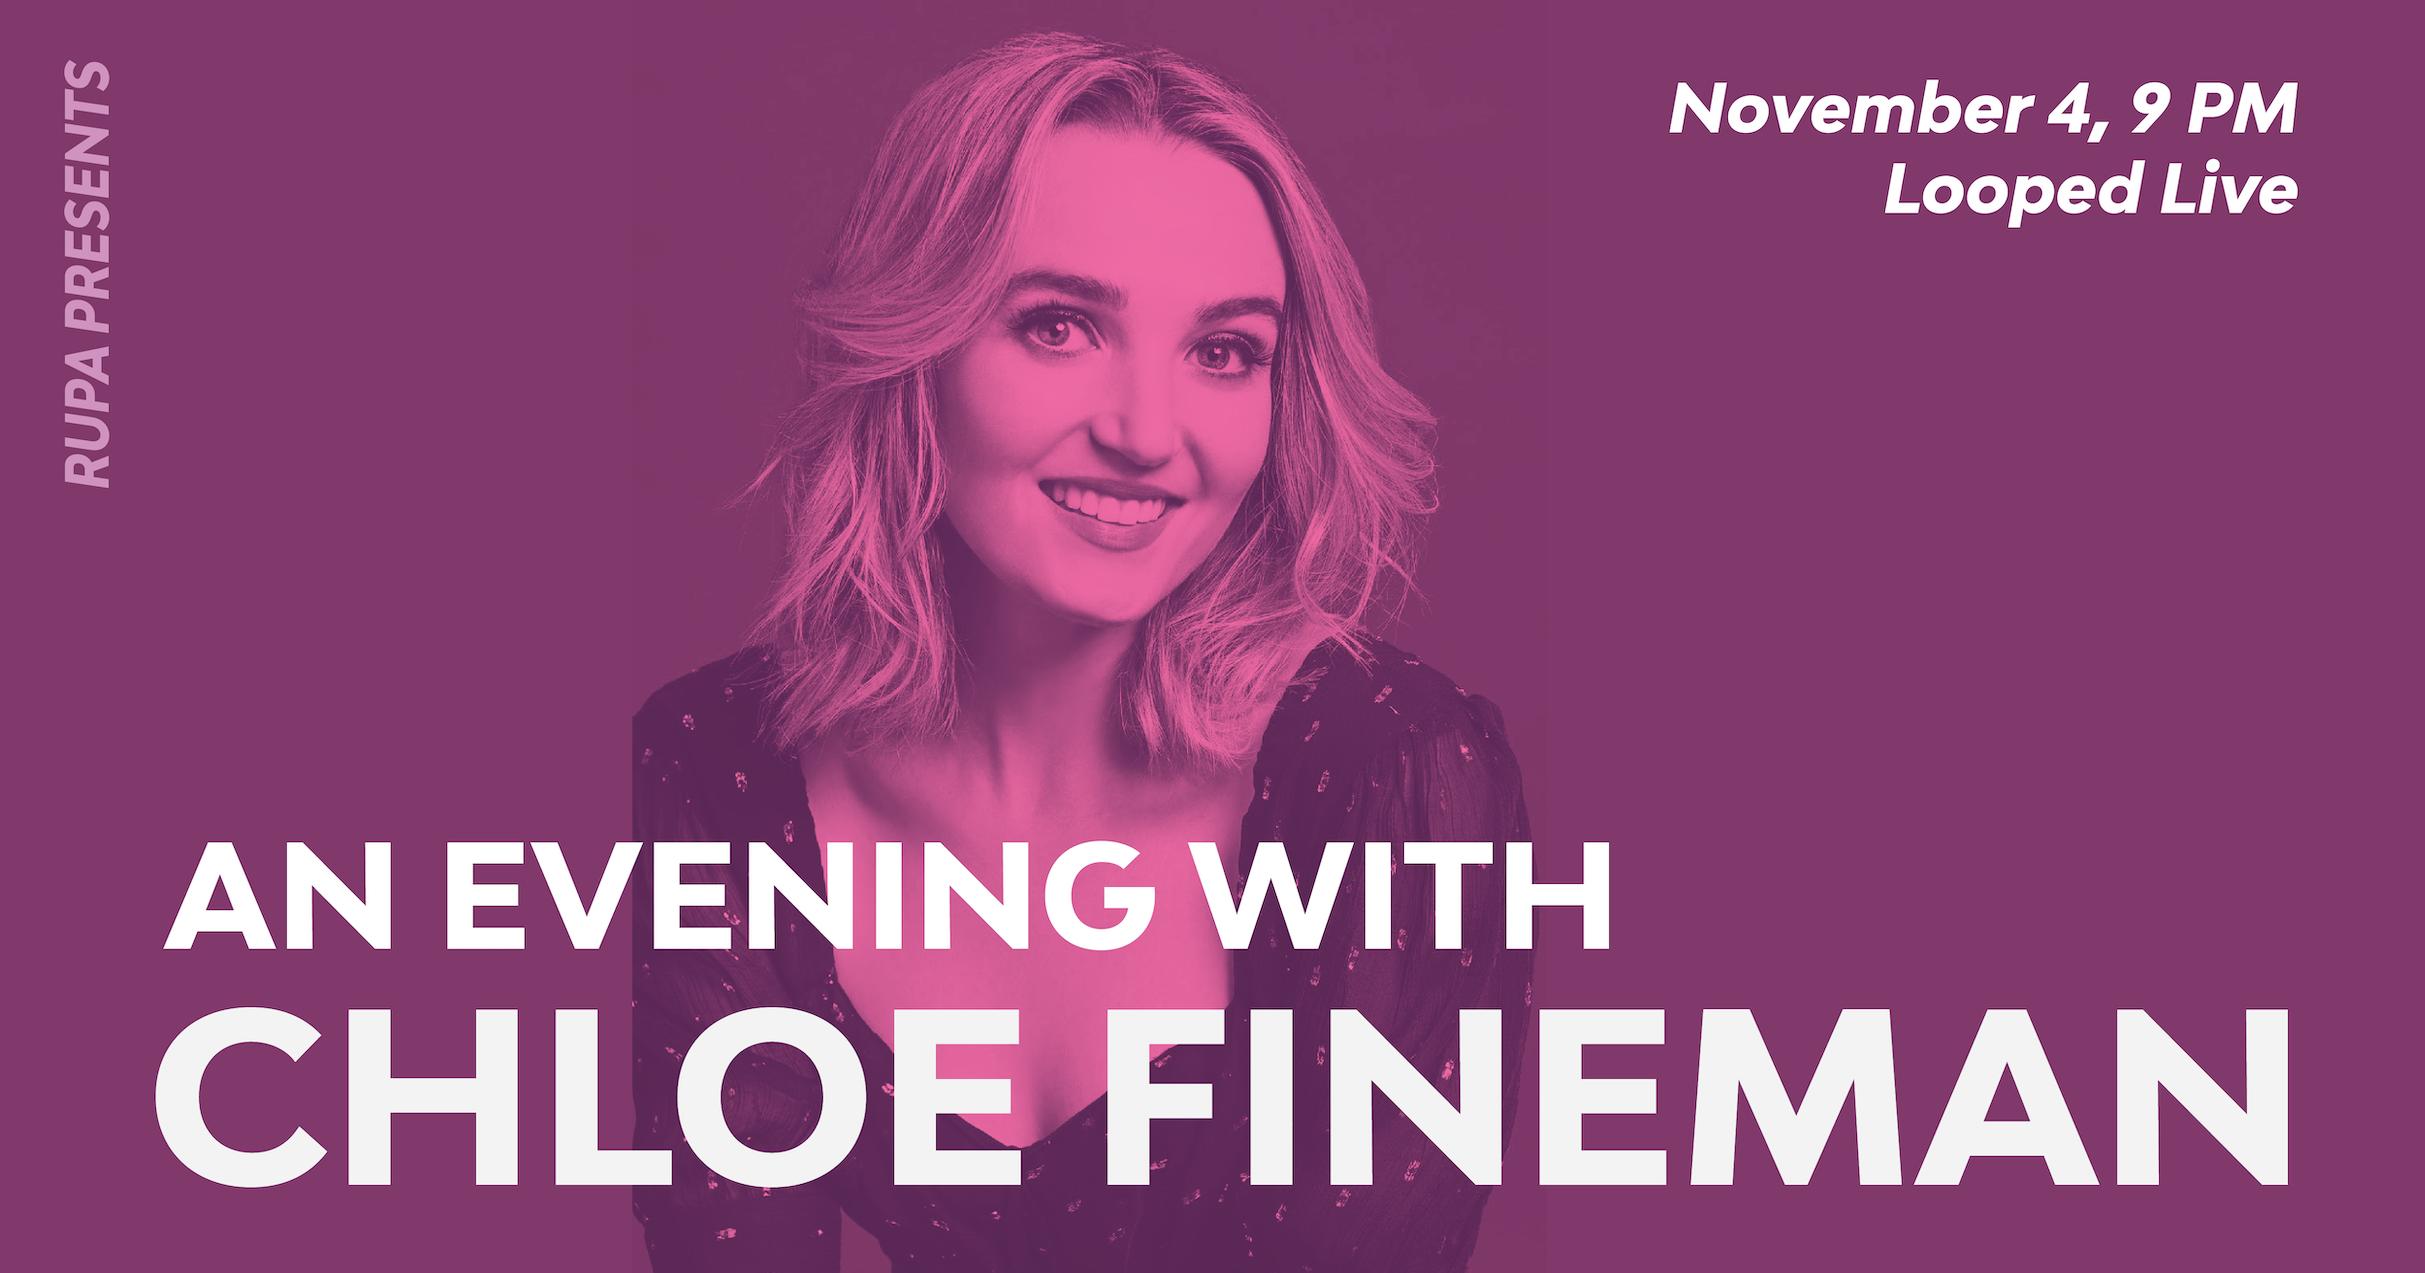 An Evening With Chloe Fineman Flyer